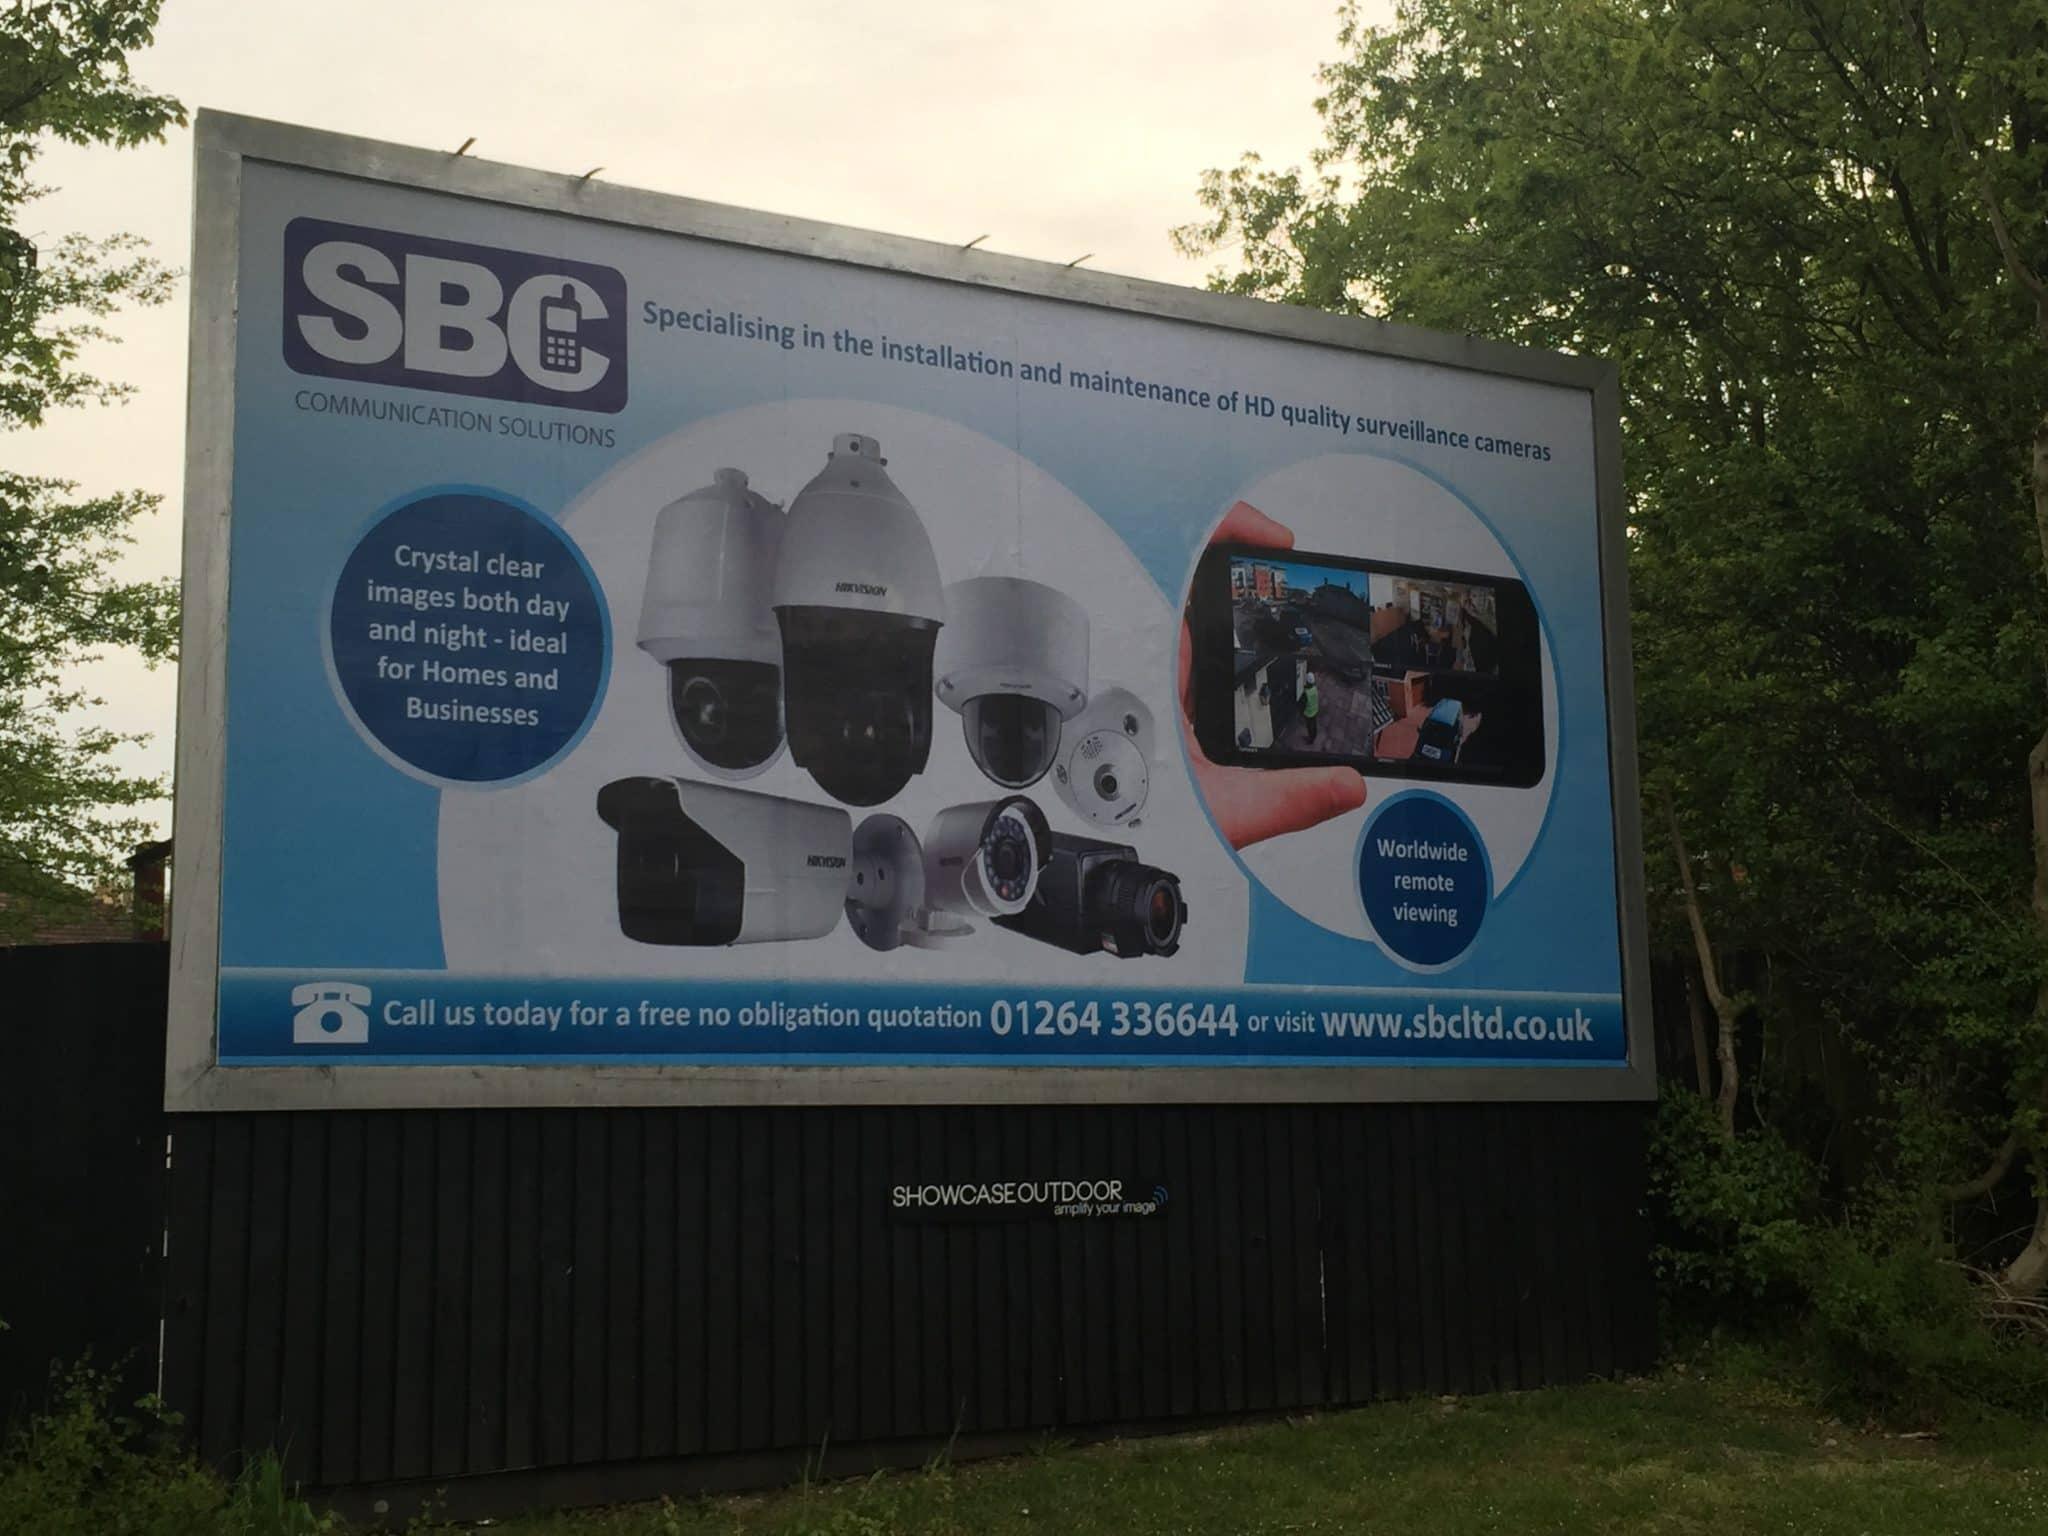 SBC HD CCTV Surveillance Cameras Go LARGE!